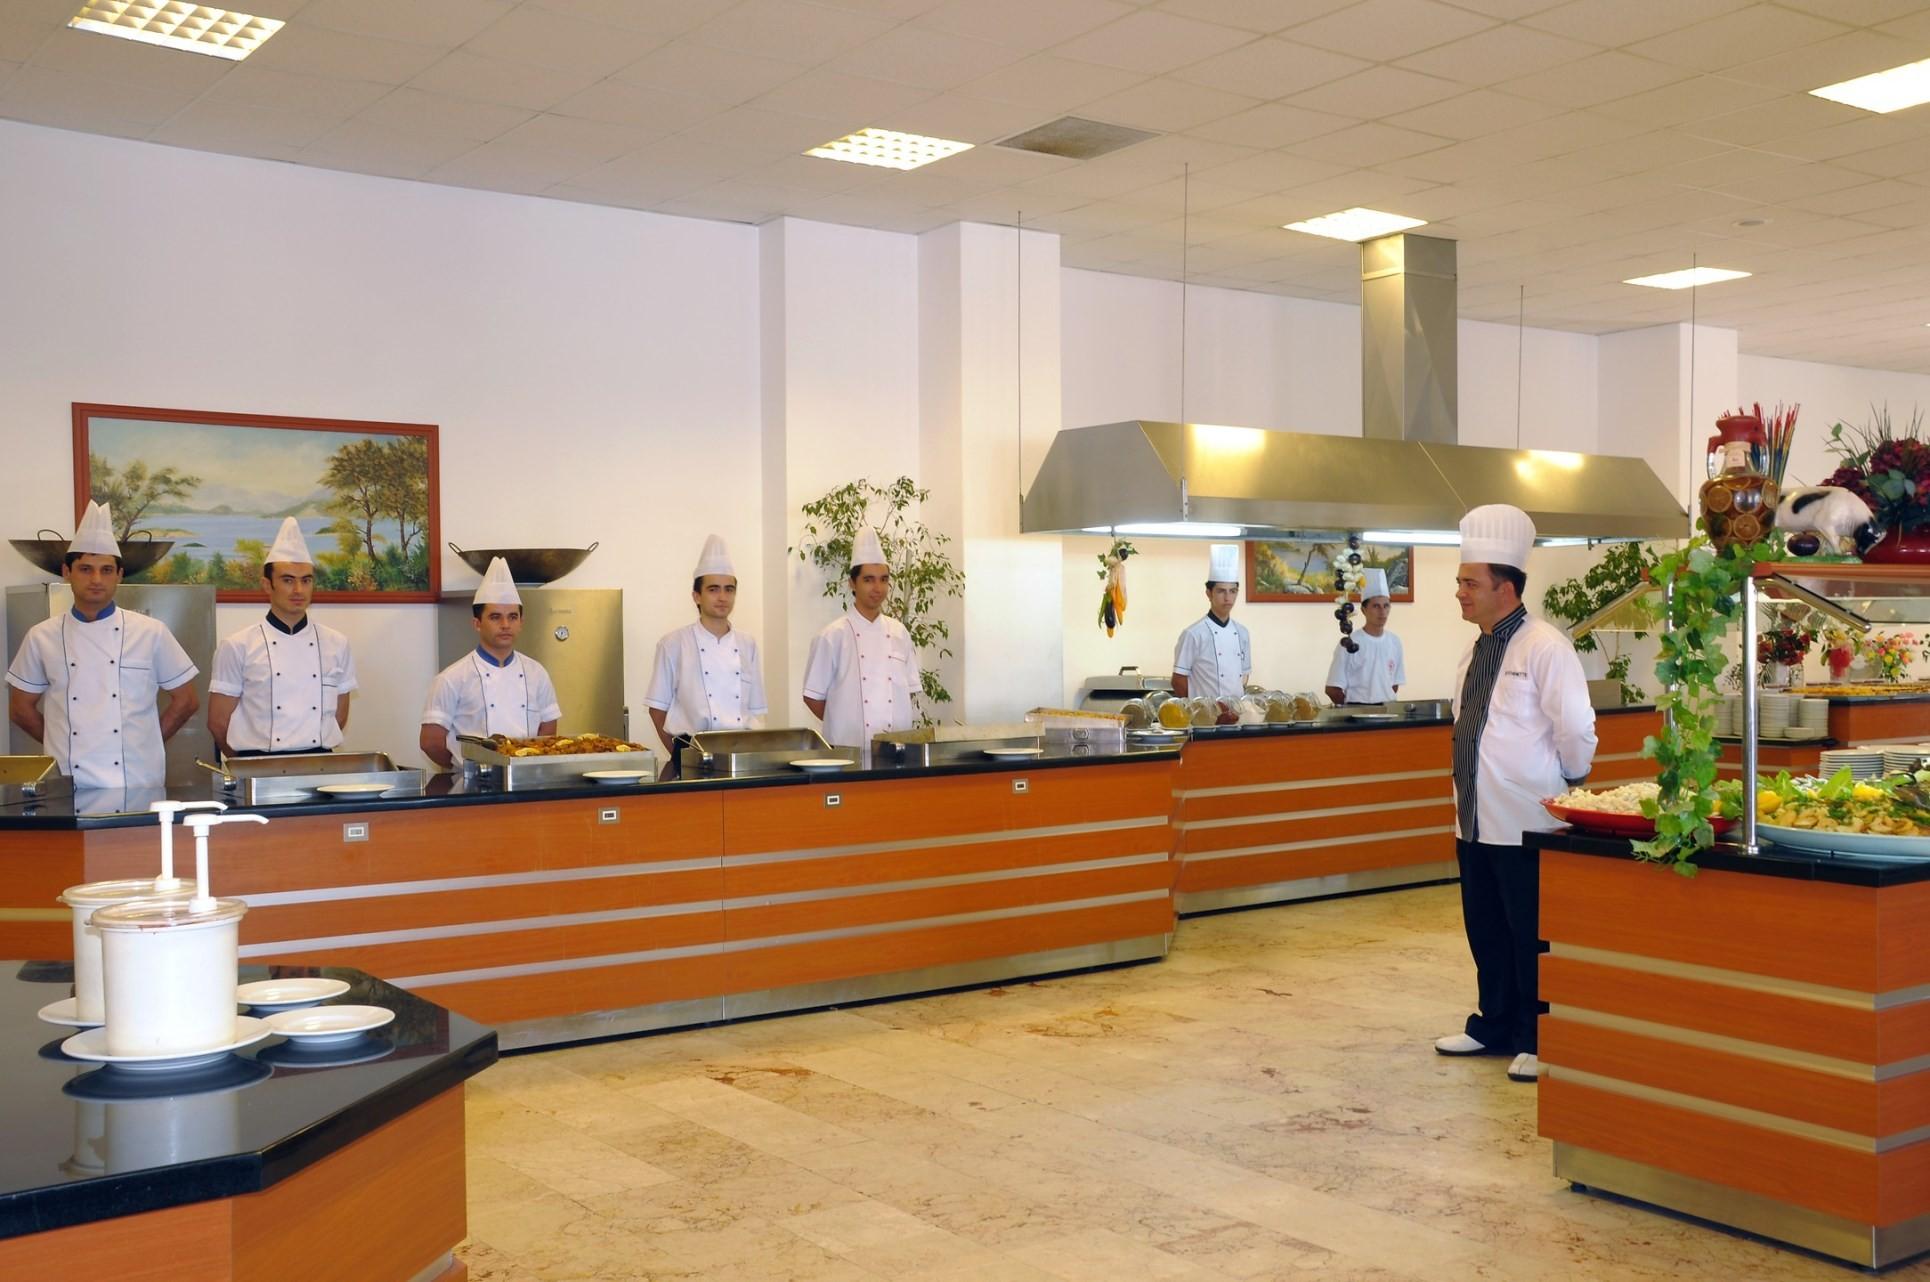 Club Hotel Grand Efe - ресторант